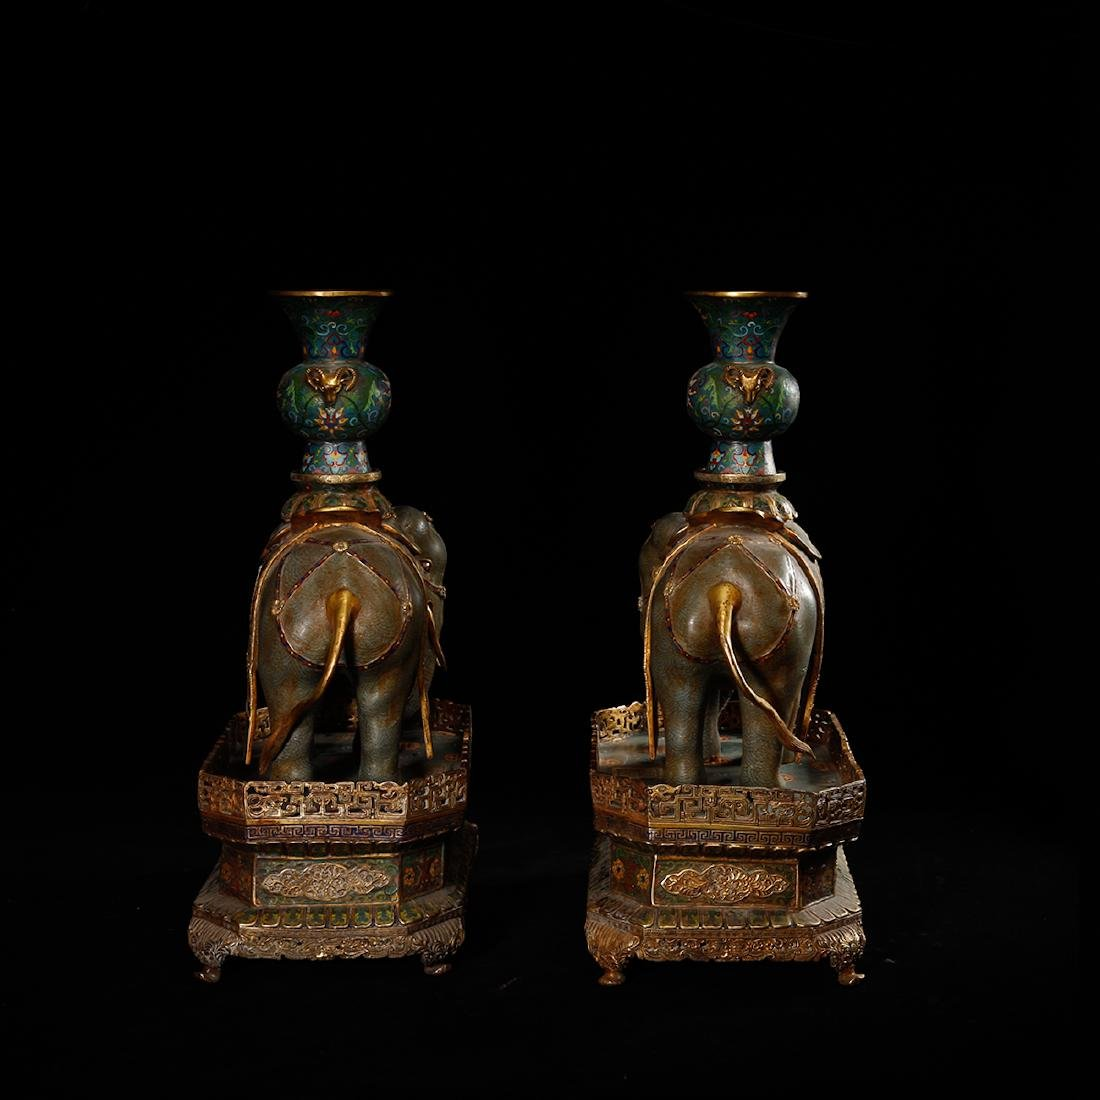 CHINESE CLOISONNE ELEPHANTS, PAIR - 4